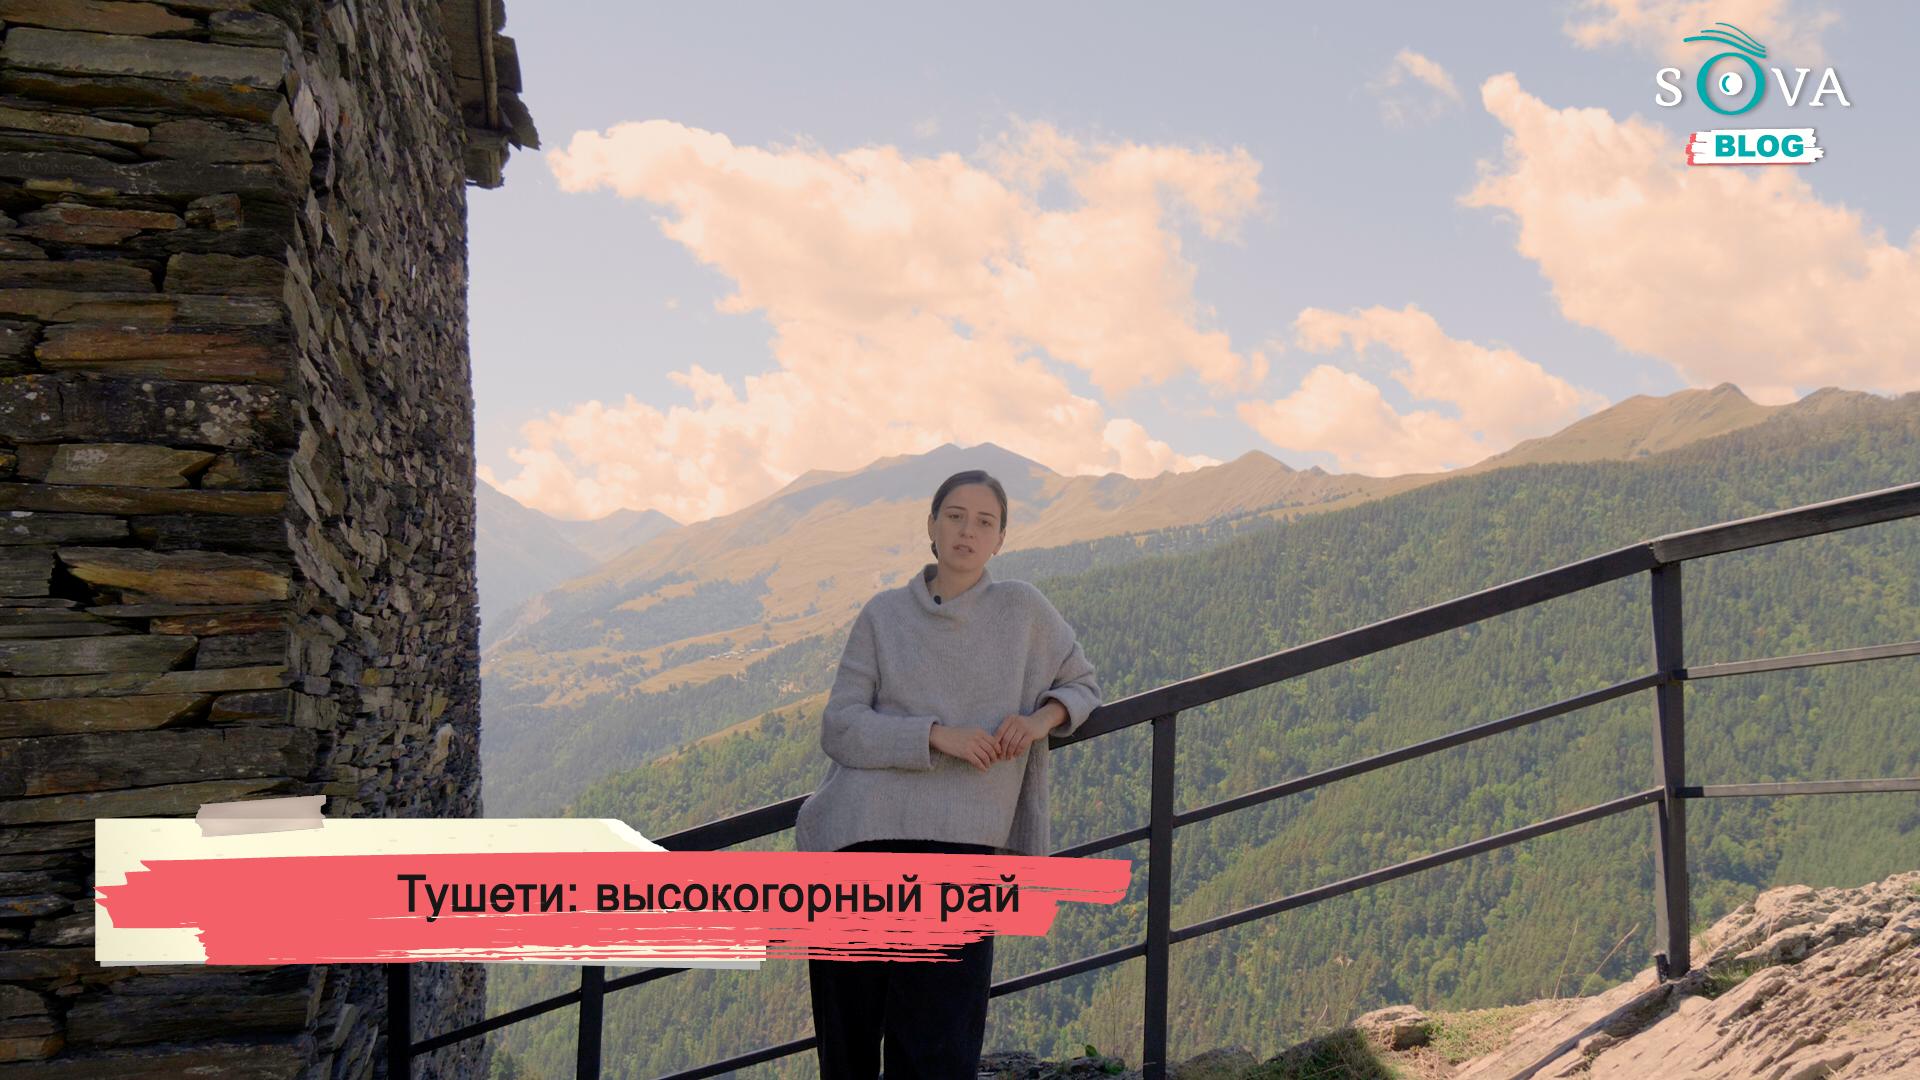 SOVA-блог